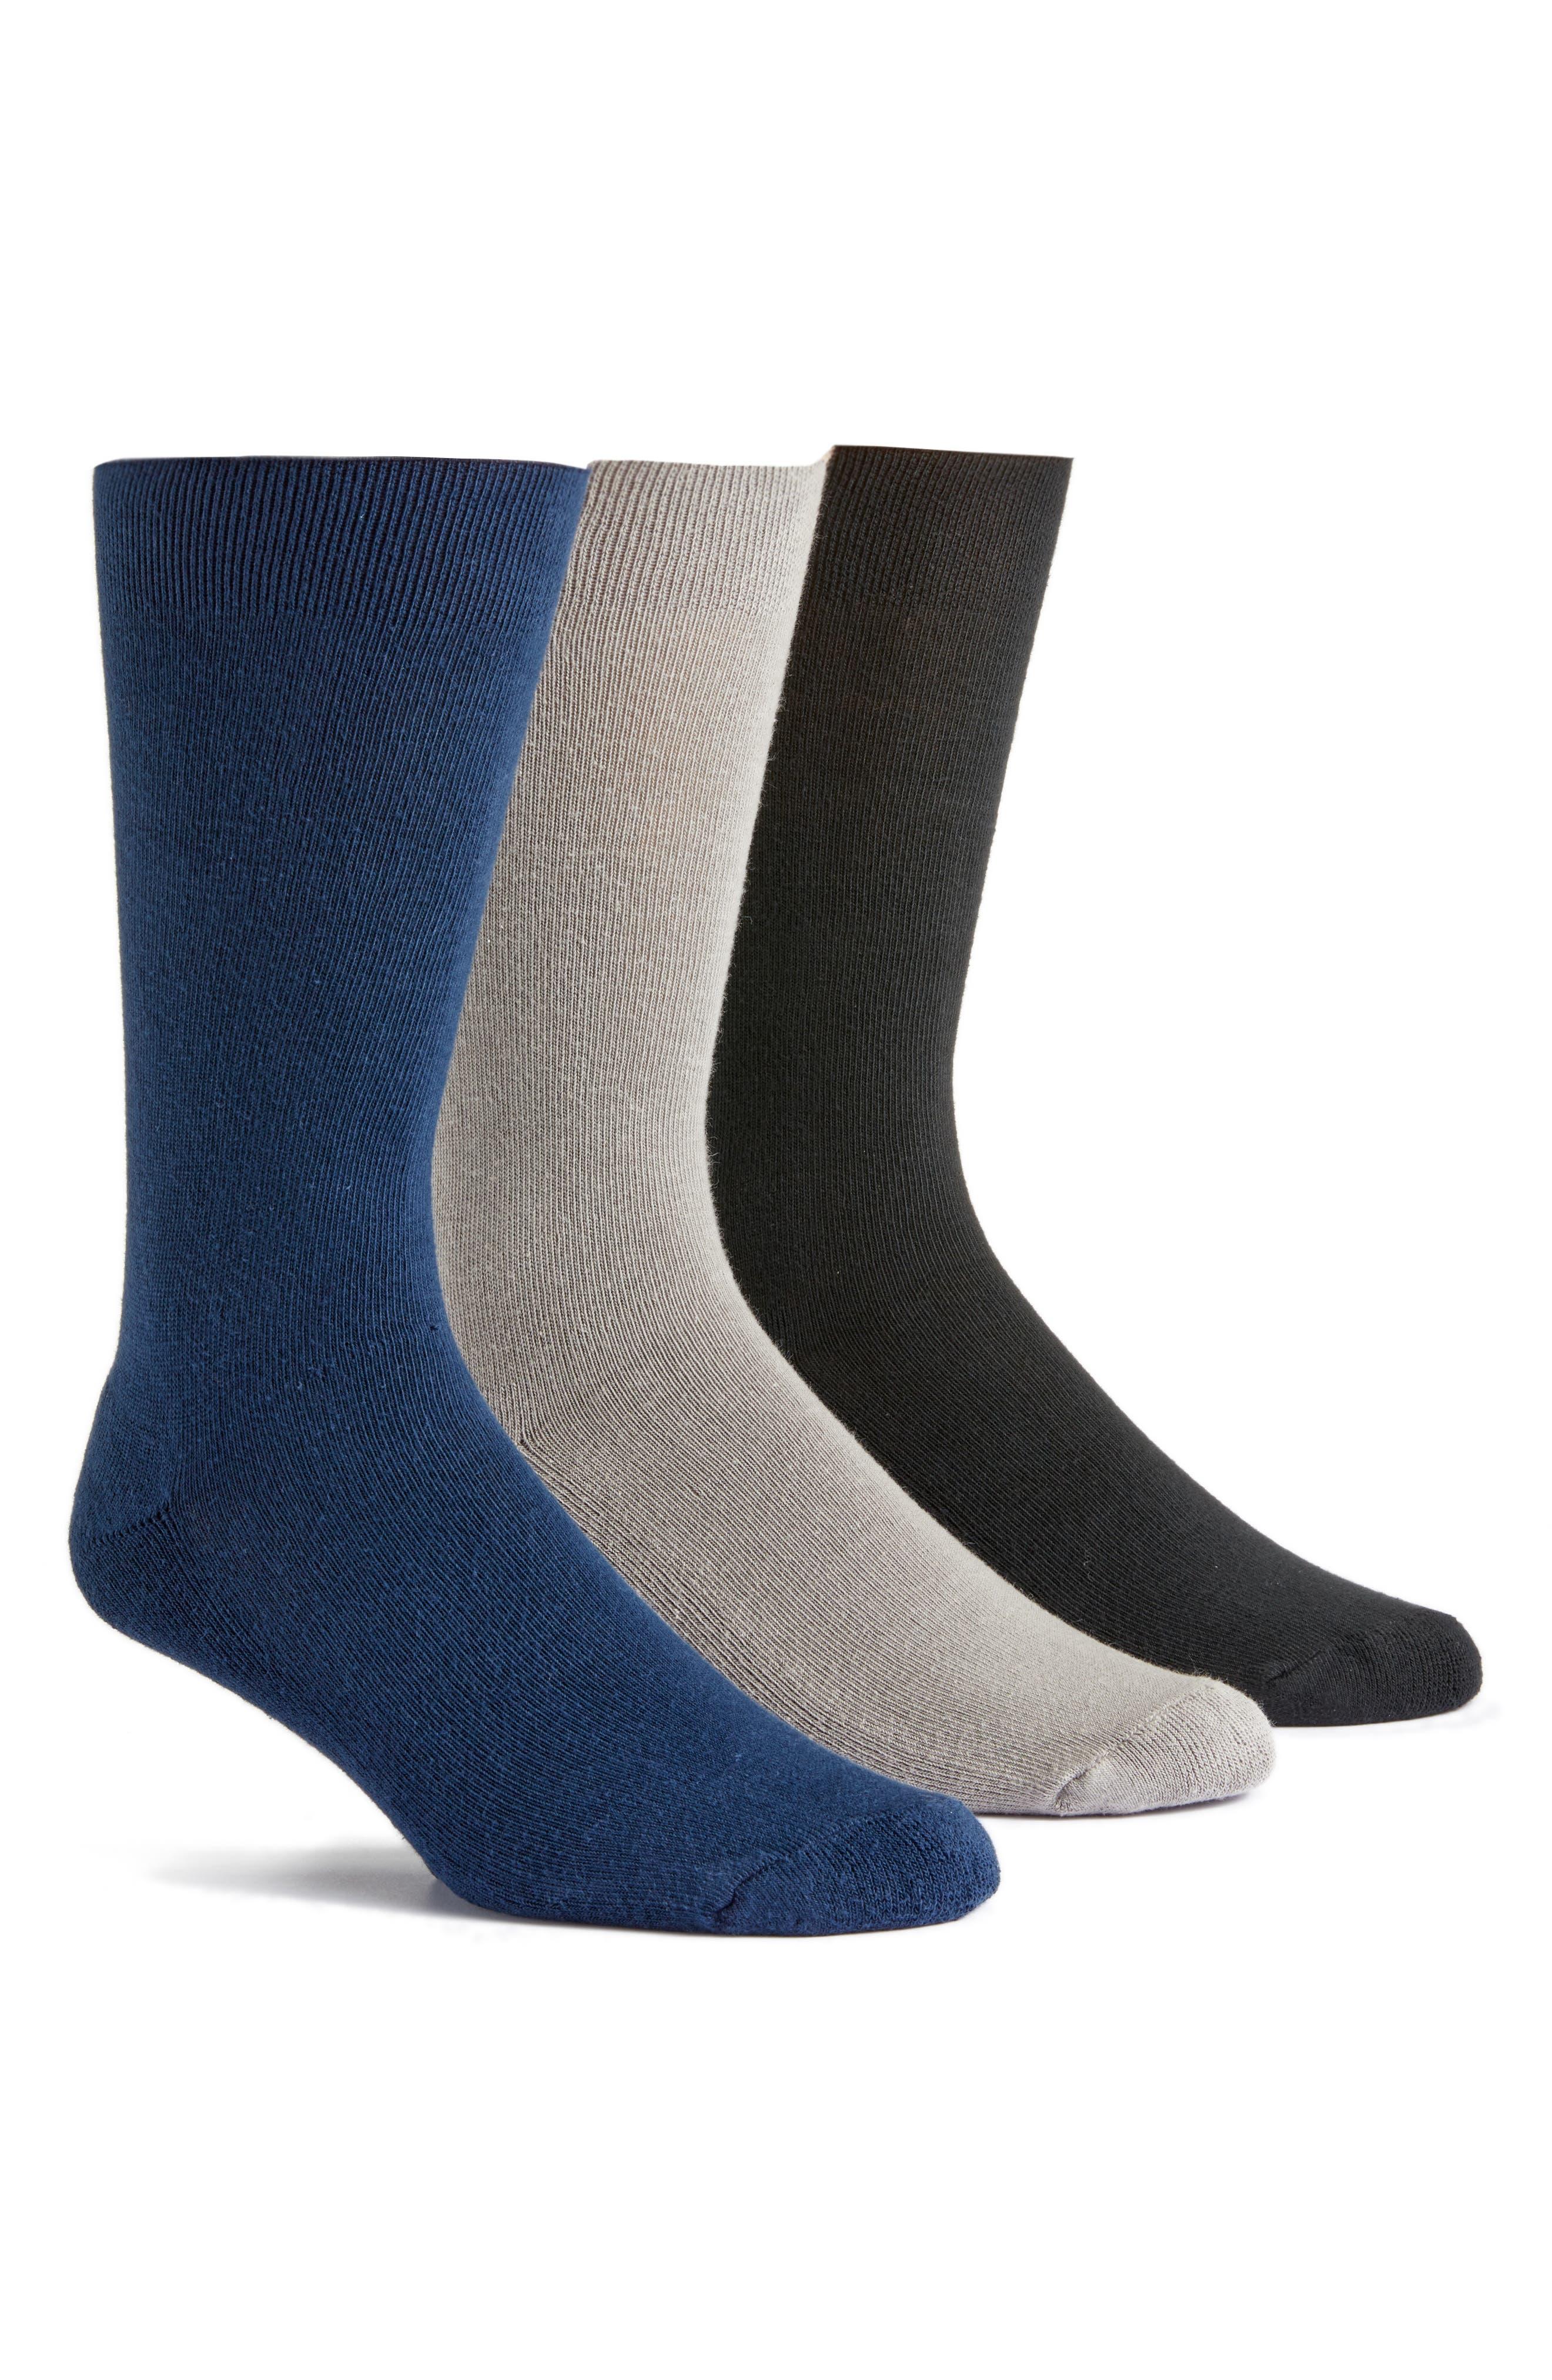 Assorted 3-Pack Organic Cotton Blend Cushion Crew Socks